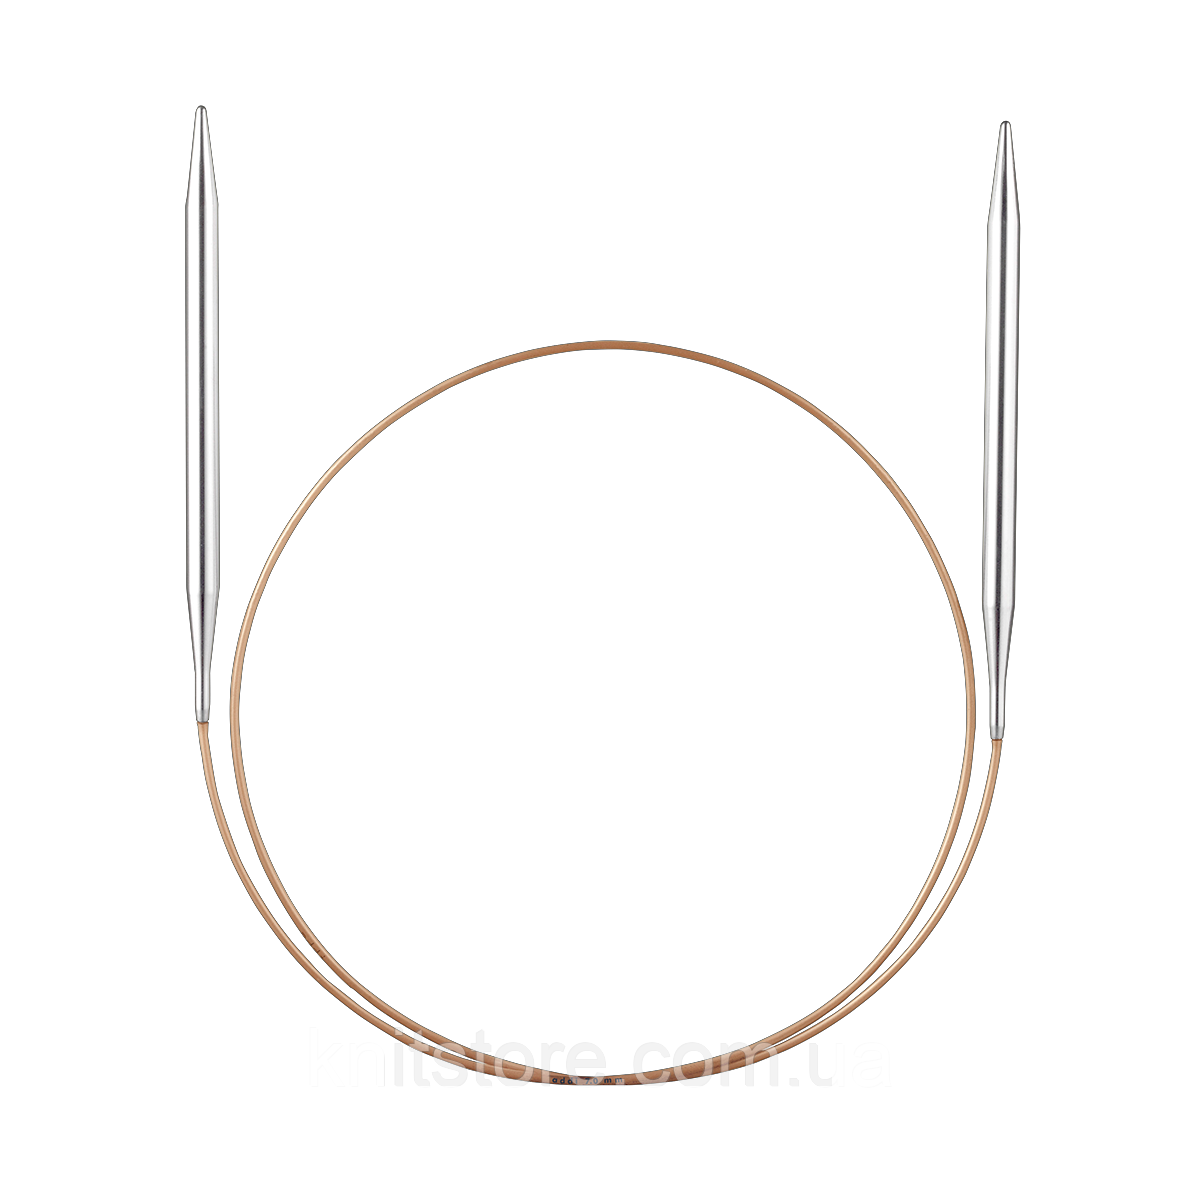 Спицы Addi 60 см/5 мм круговые